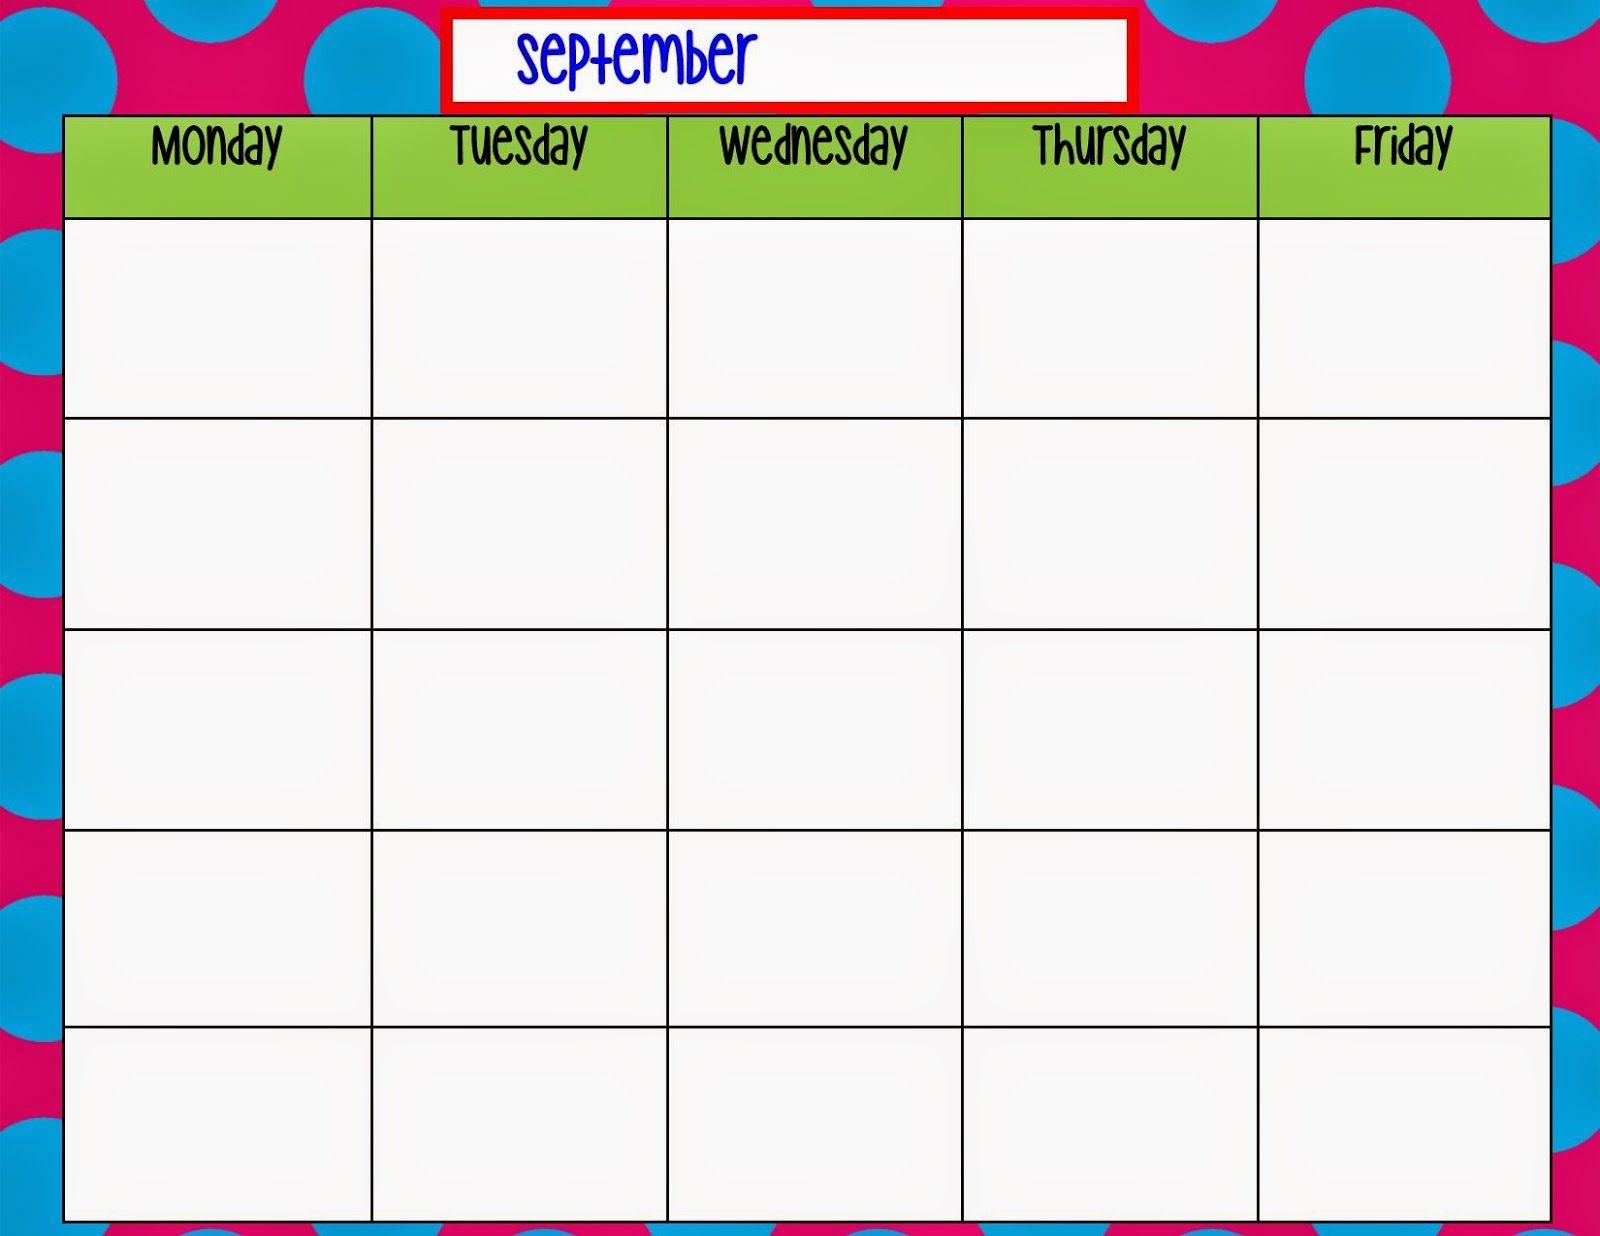 Monday+Through+Friday+Calendar+Template | Weekly Calendar pertaining to Monday Through Friday Calendar Template